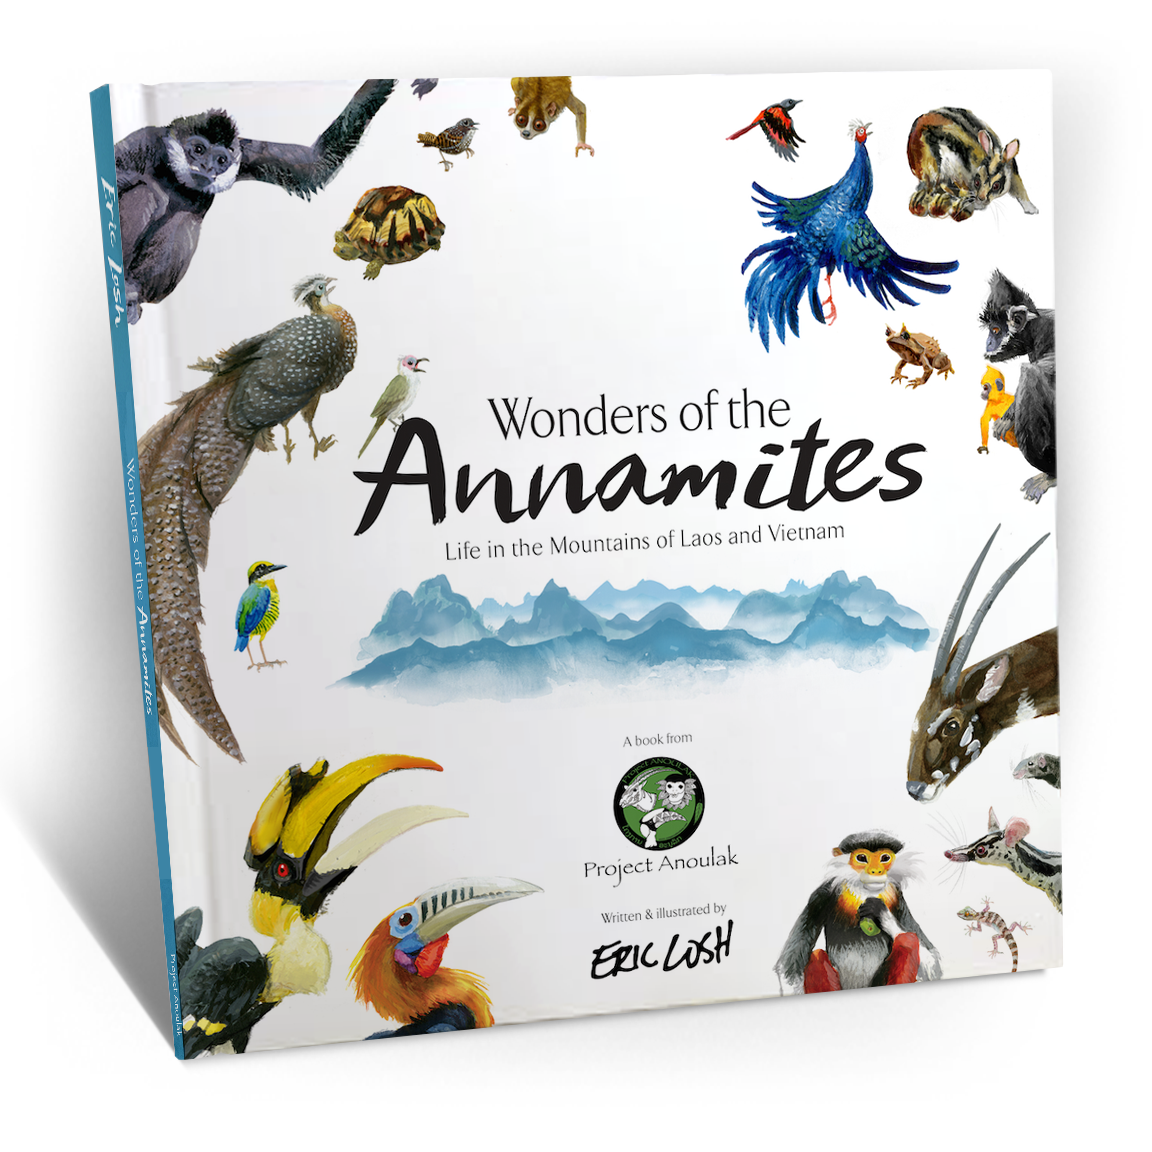 Wonders_of_the_Annamites-by_Eric_Losh.jpg